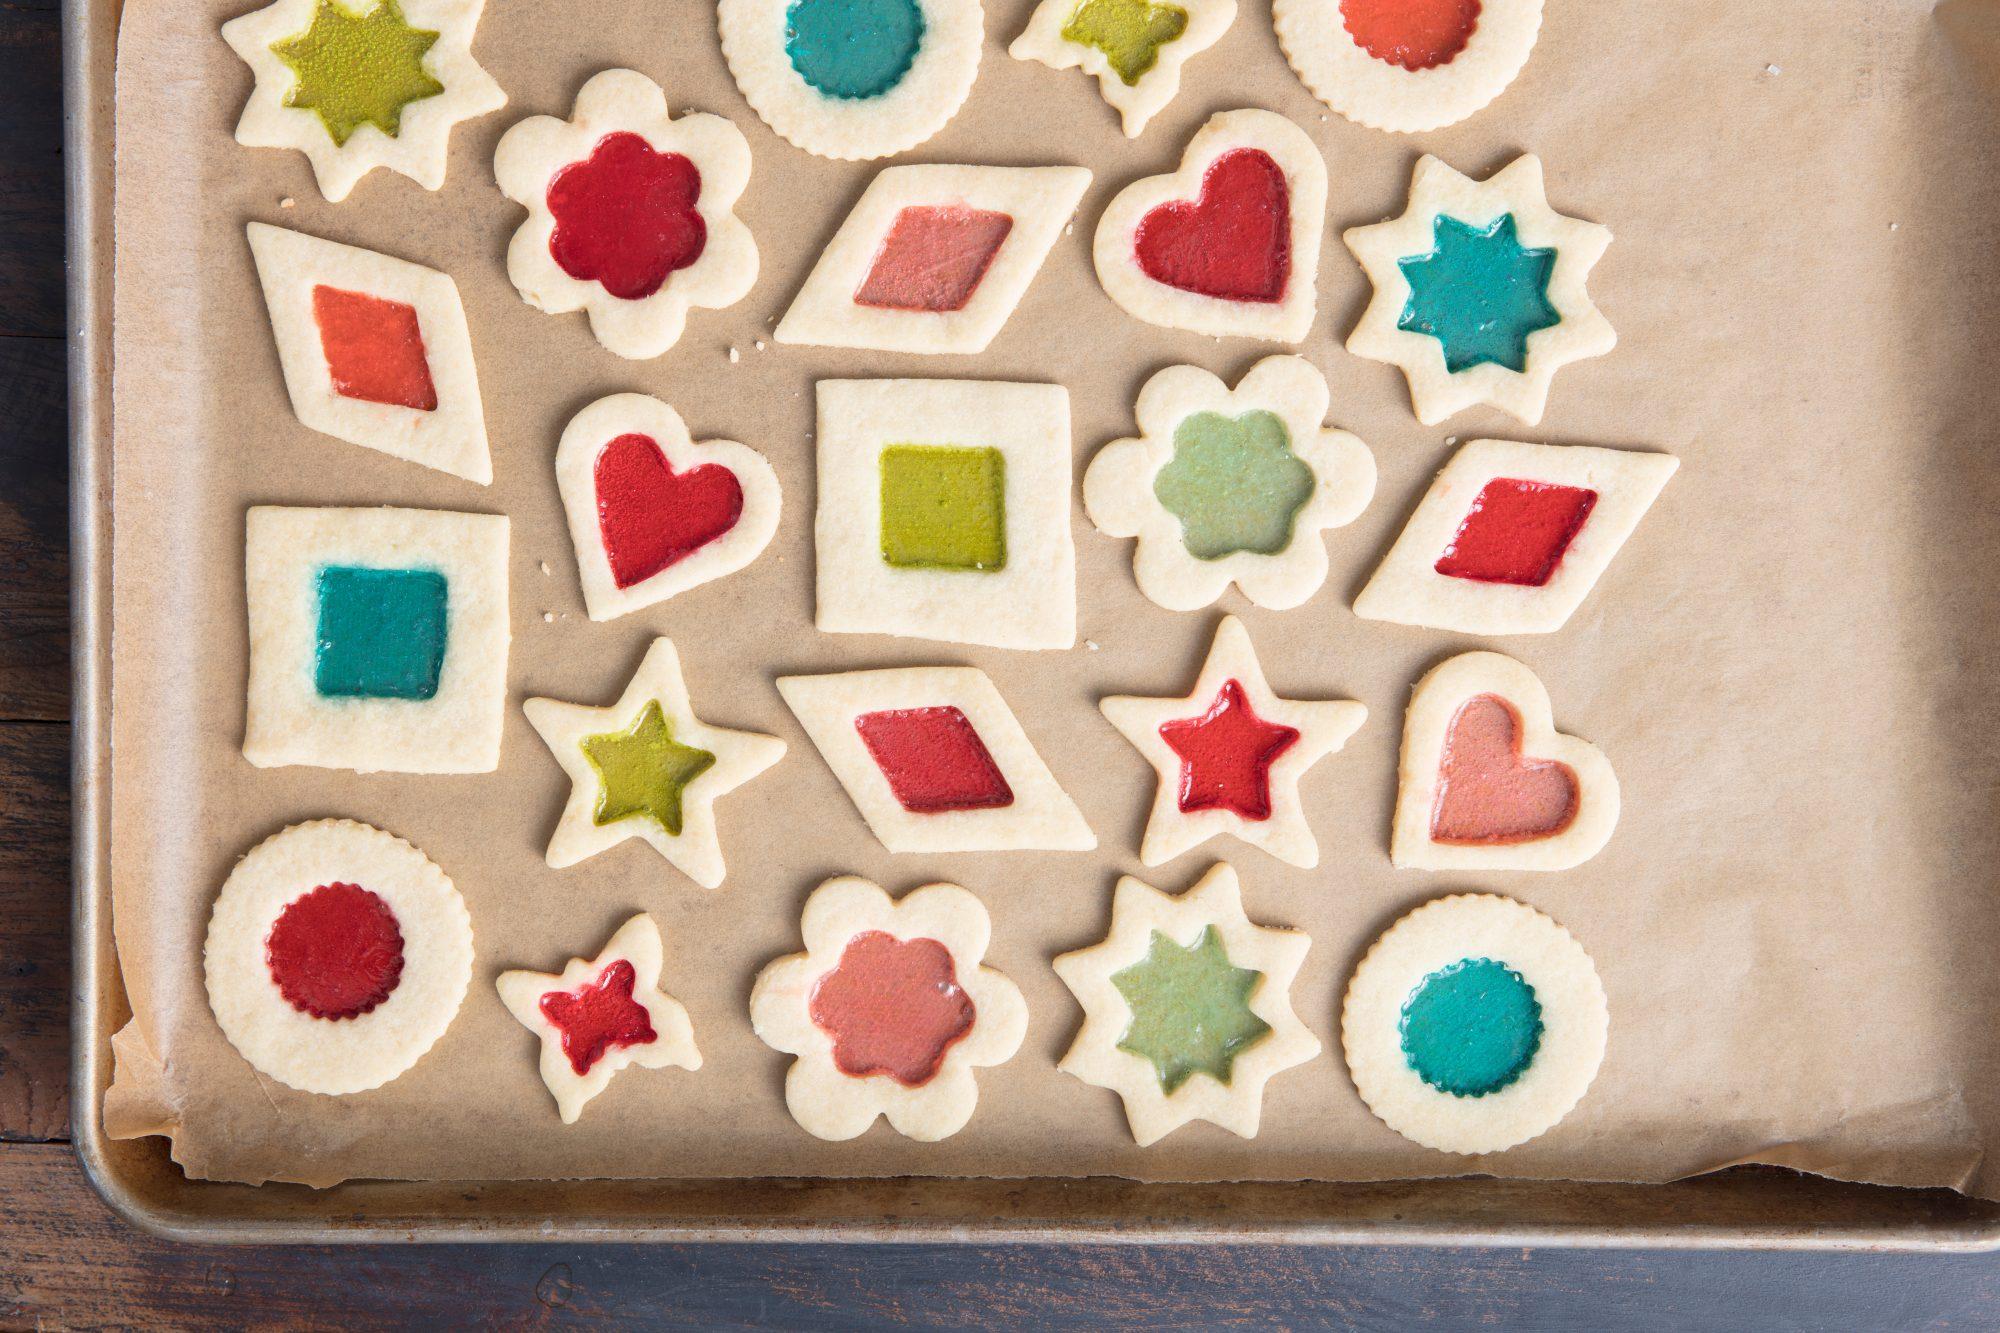 stained-glass-cookies-su.jpg